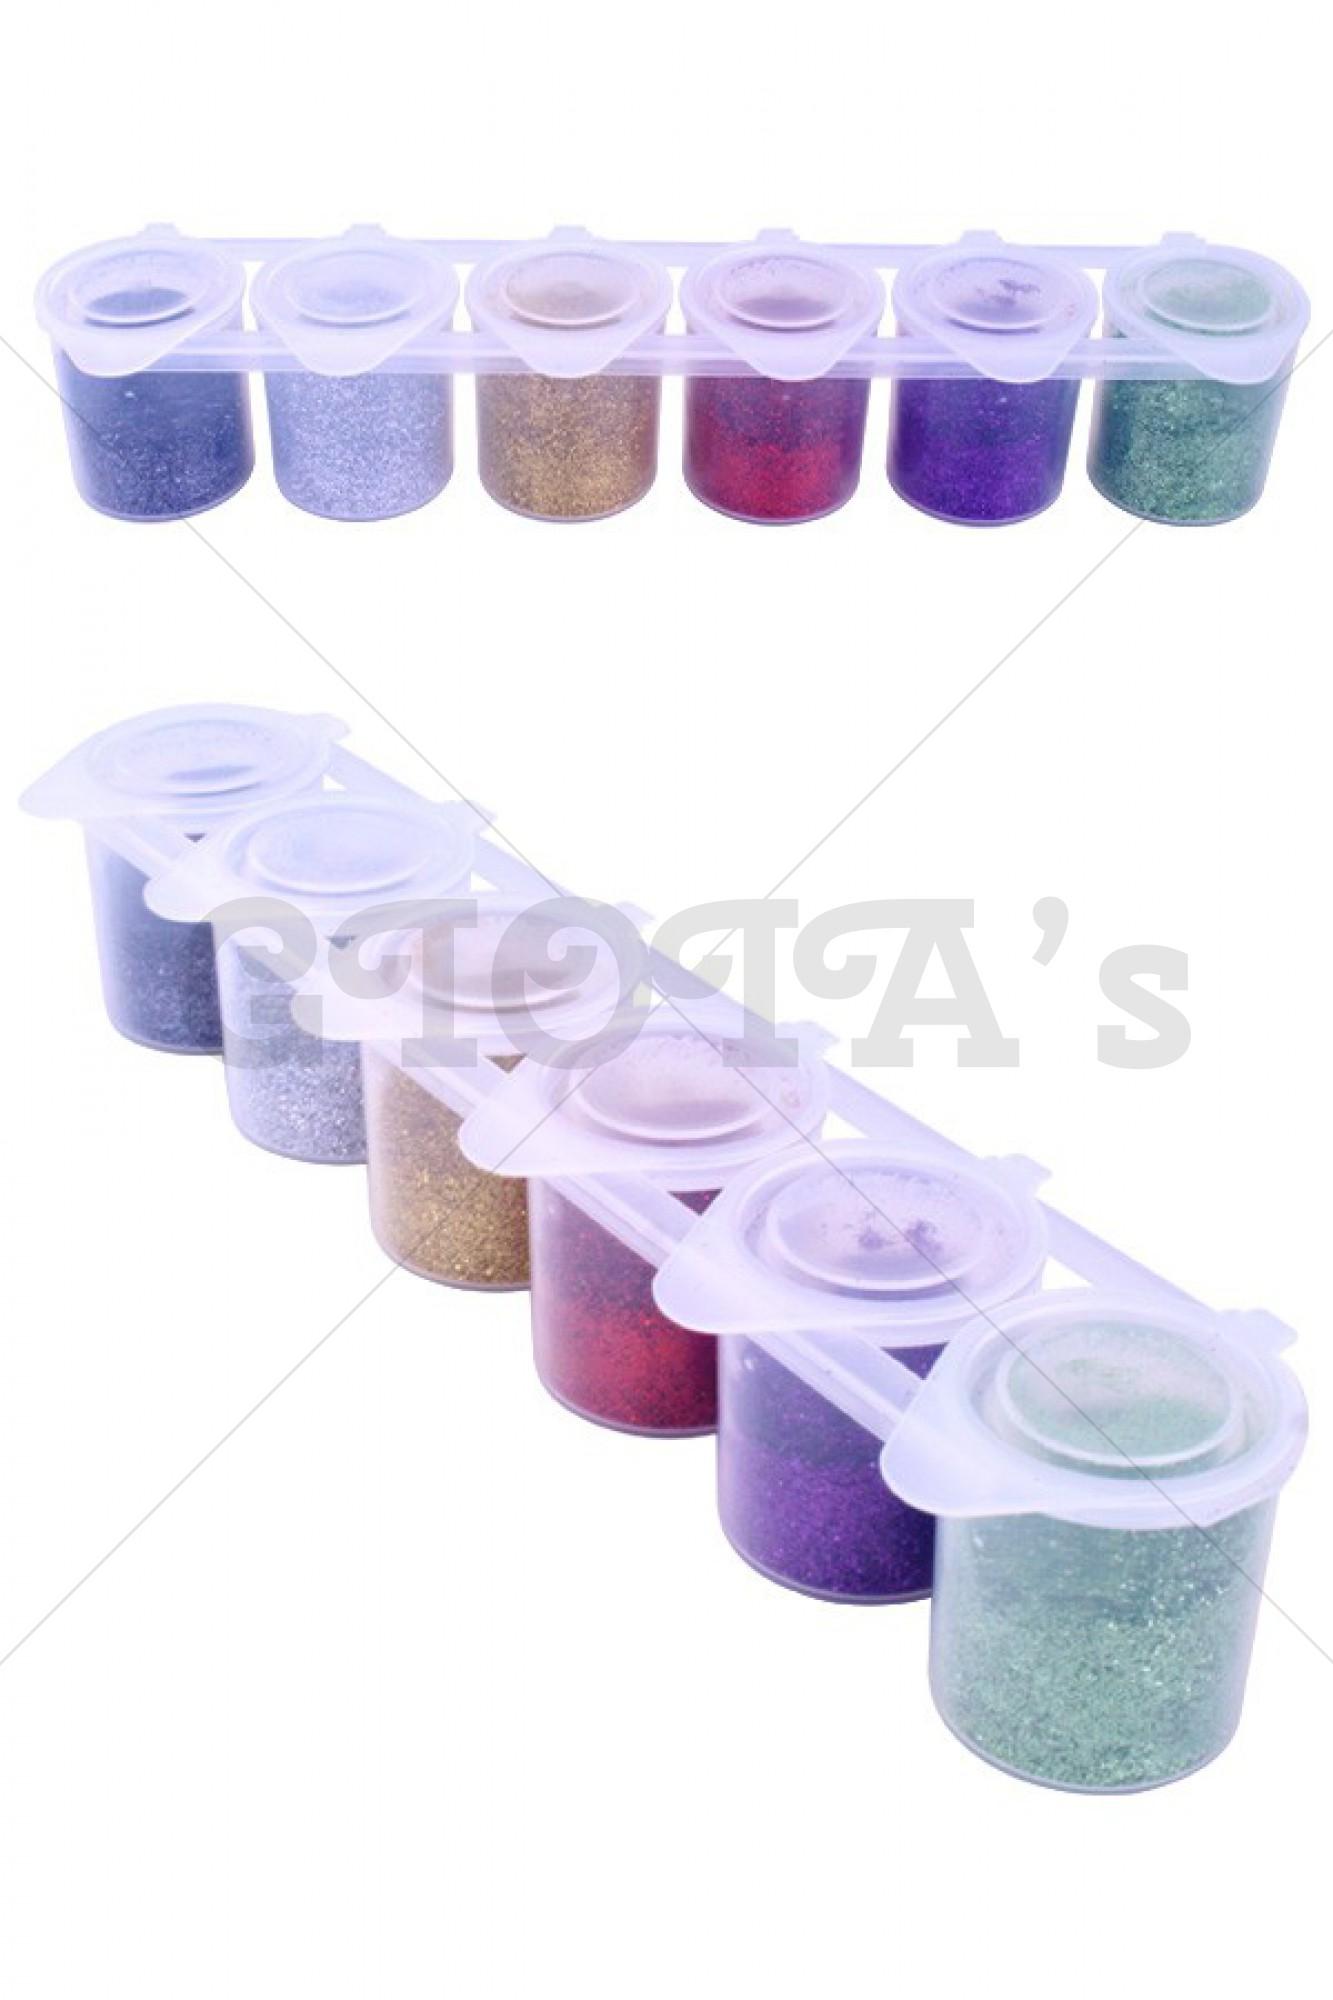 Tattoo huidglitter colorxplosion glitter color set 6x13 gram Ybody